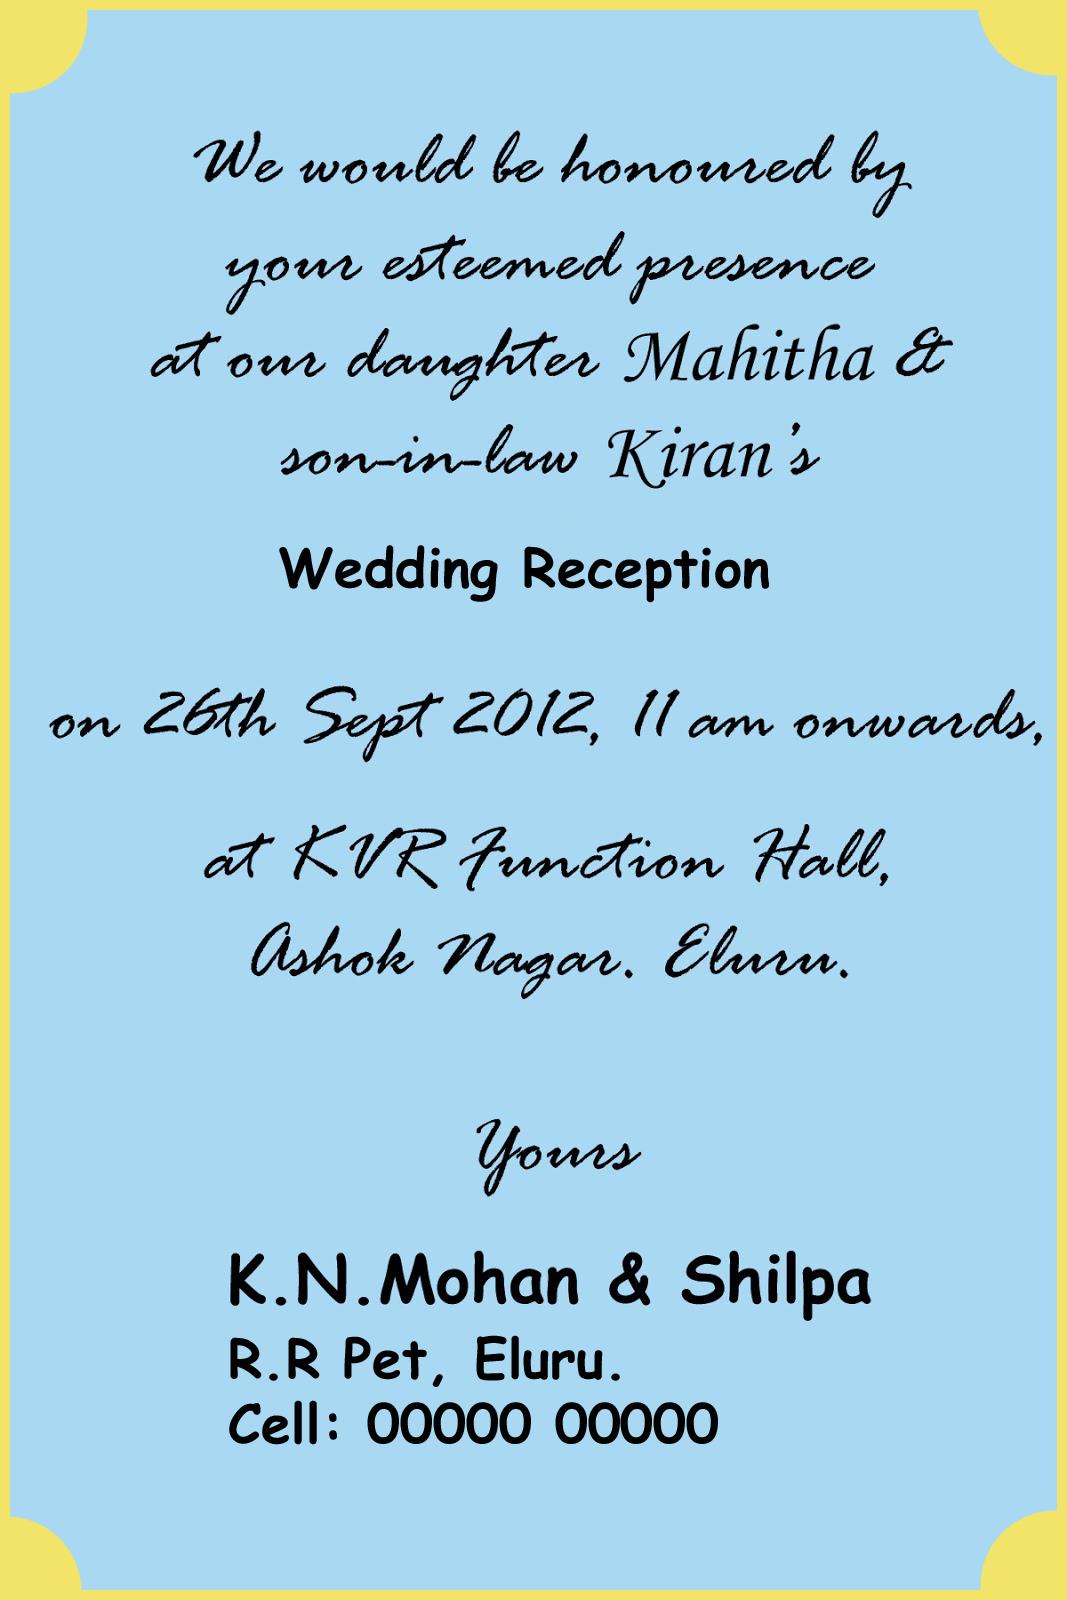 Indian Wedding Invitation Cards Quotes Wedding Invitation Sample